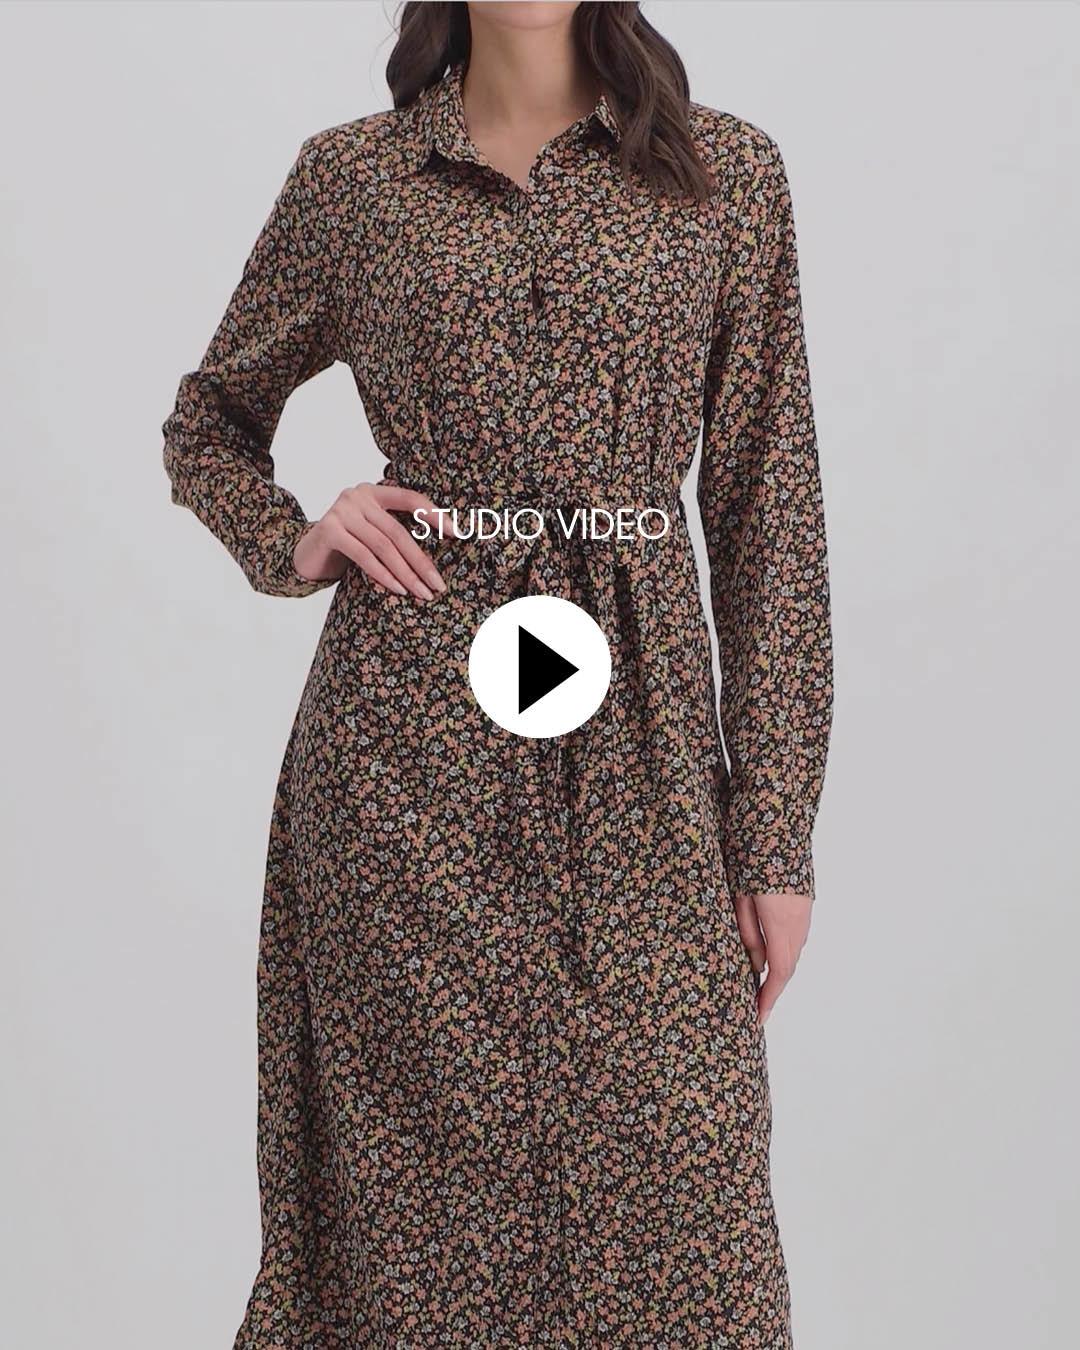 Lofty Manner Black Floral Print Maxi Dress Daisy